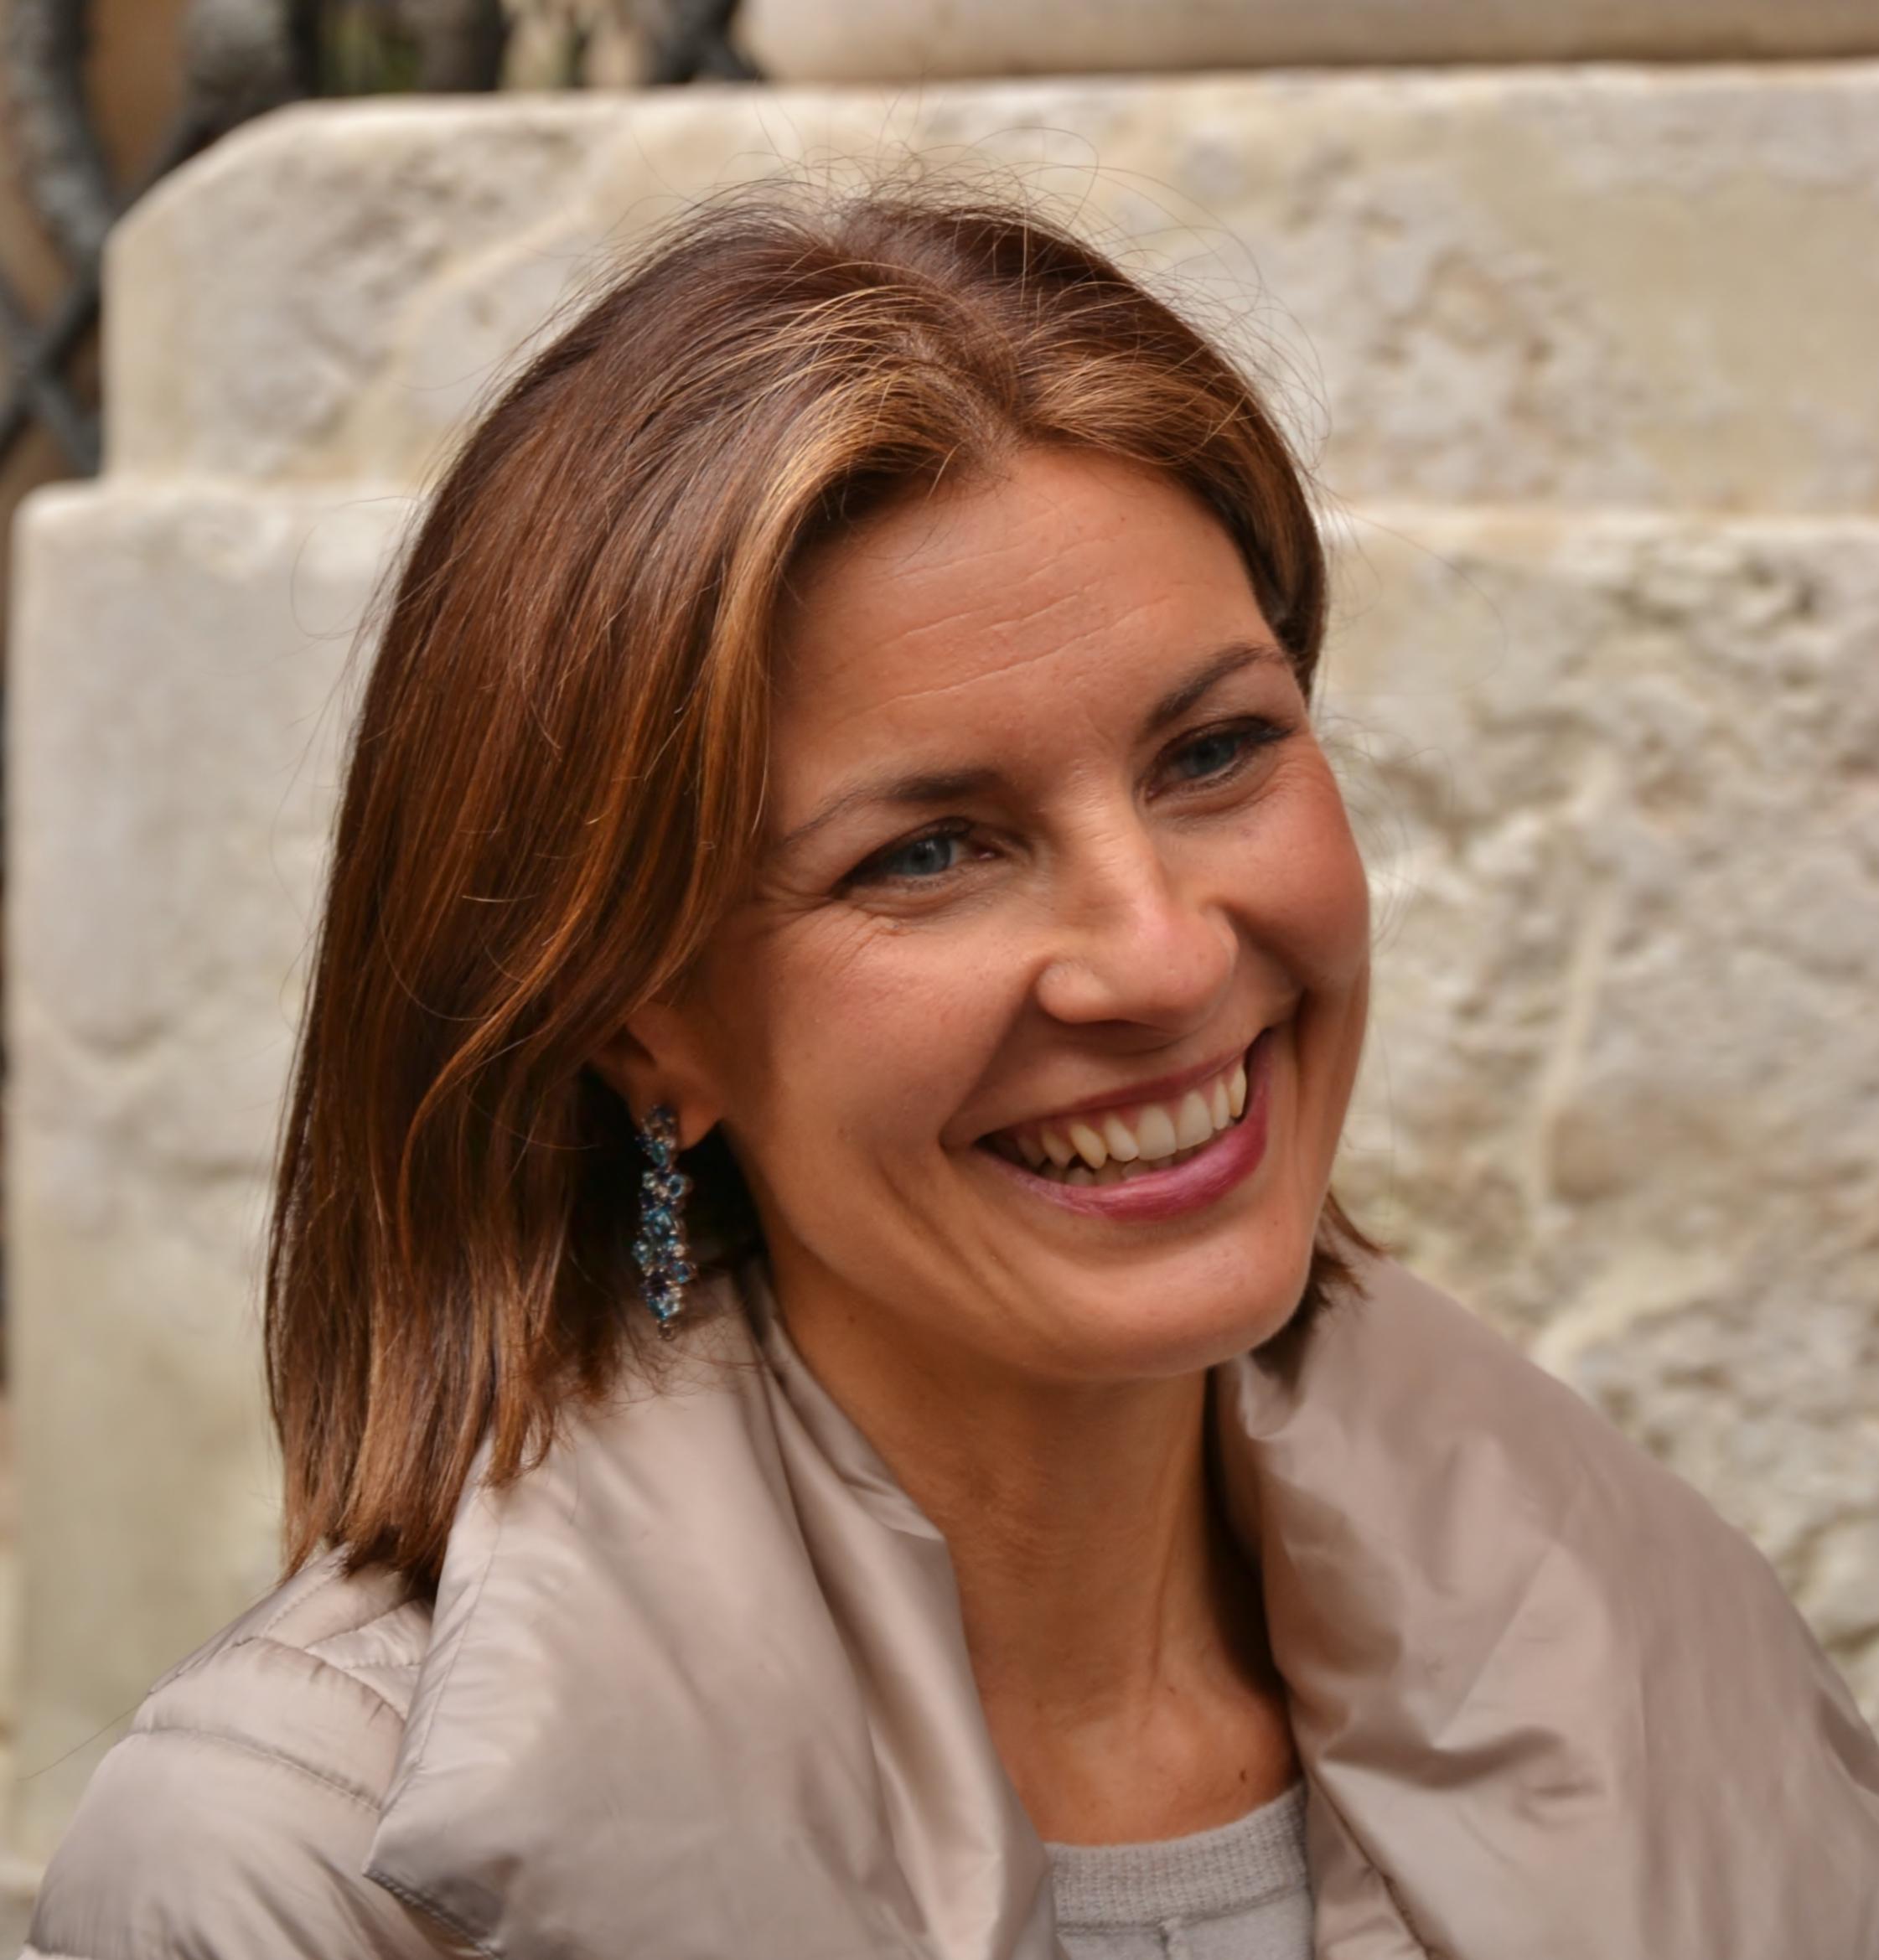 Alessandra moretti wikiwand for Deputate pd donne elenco